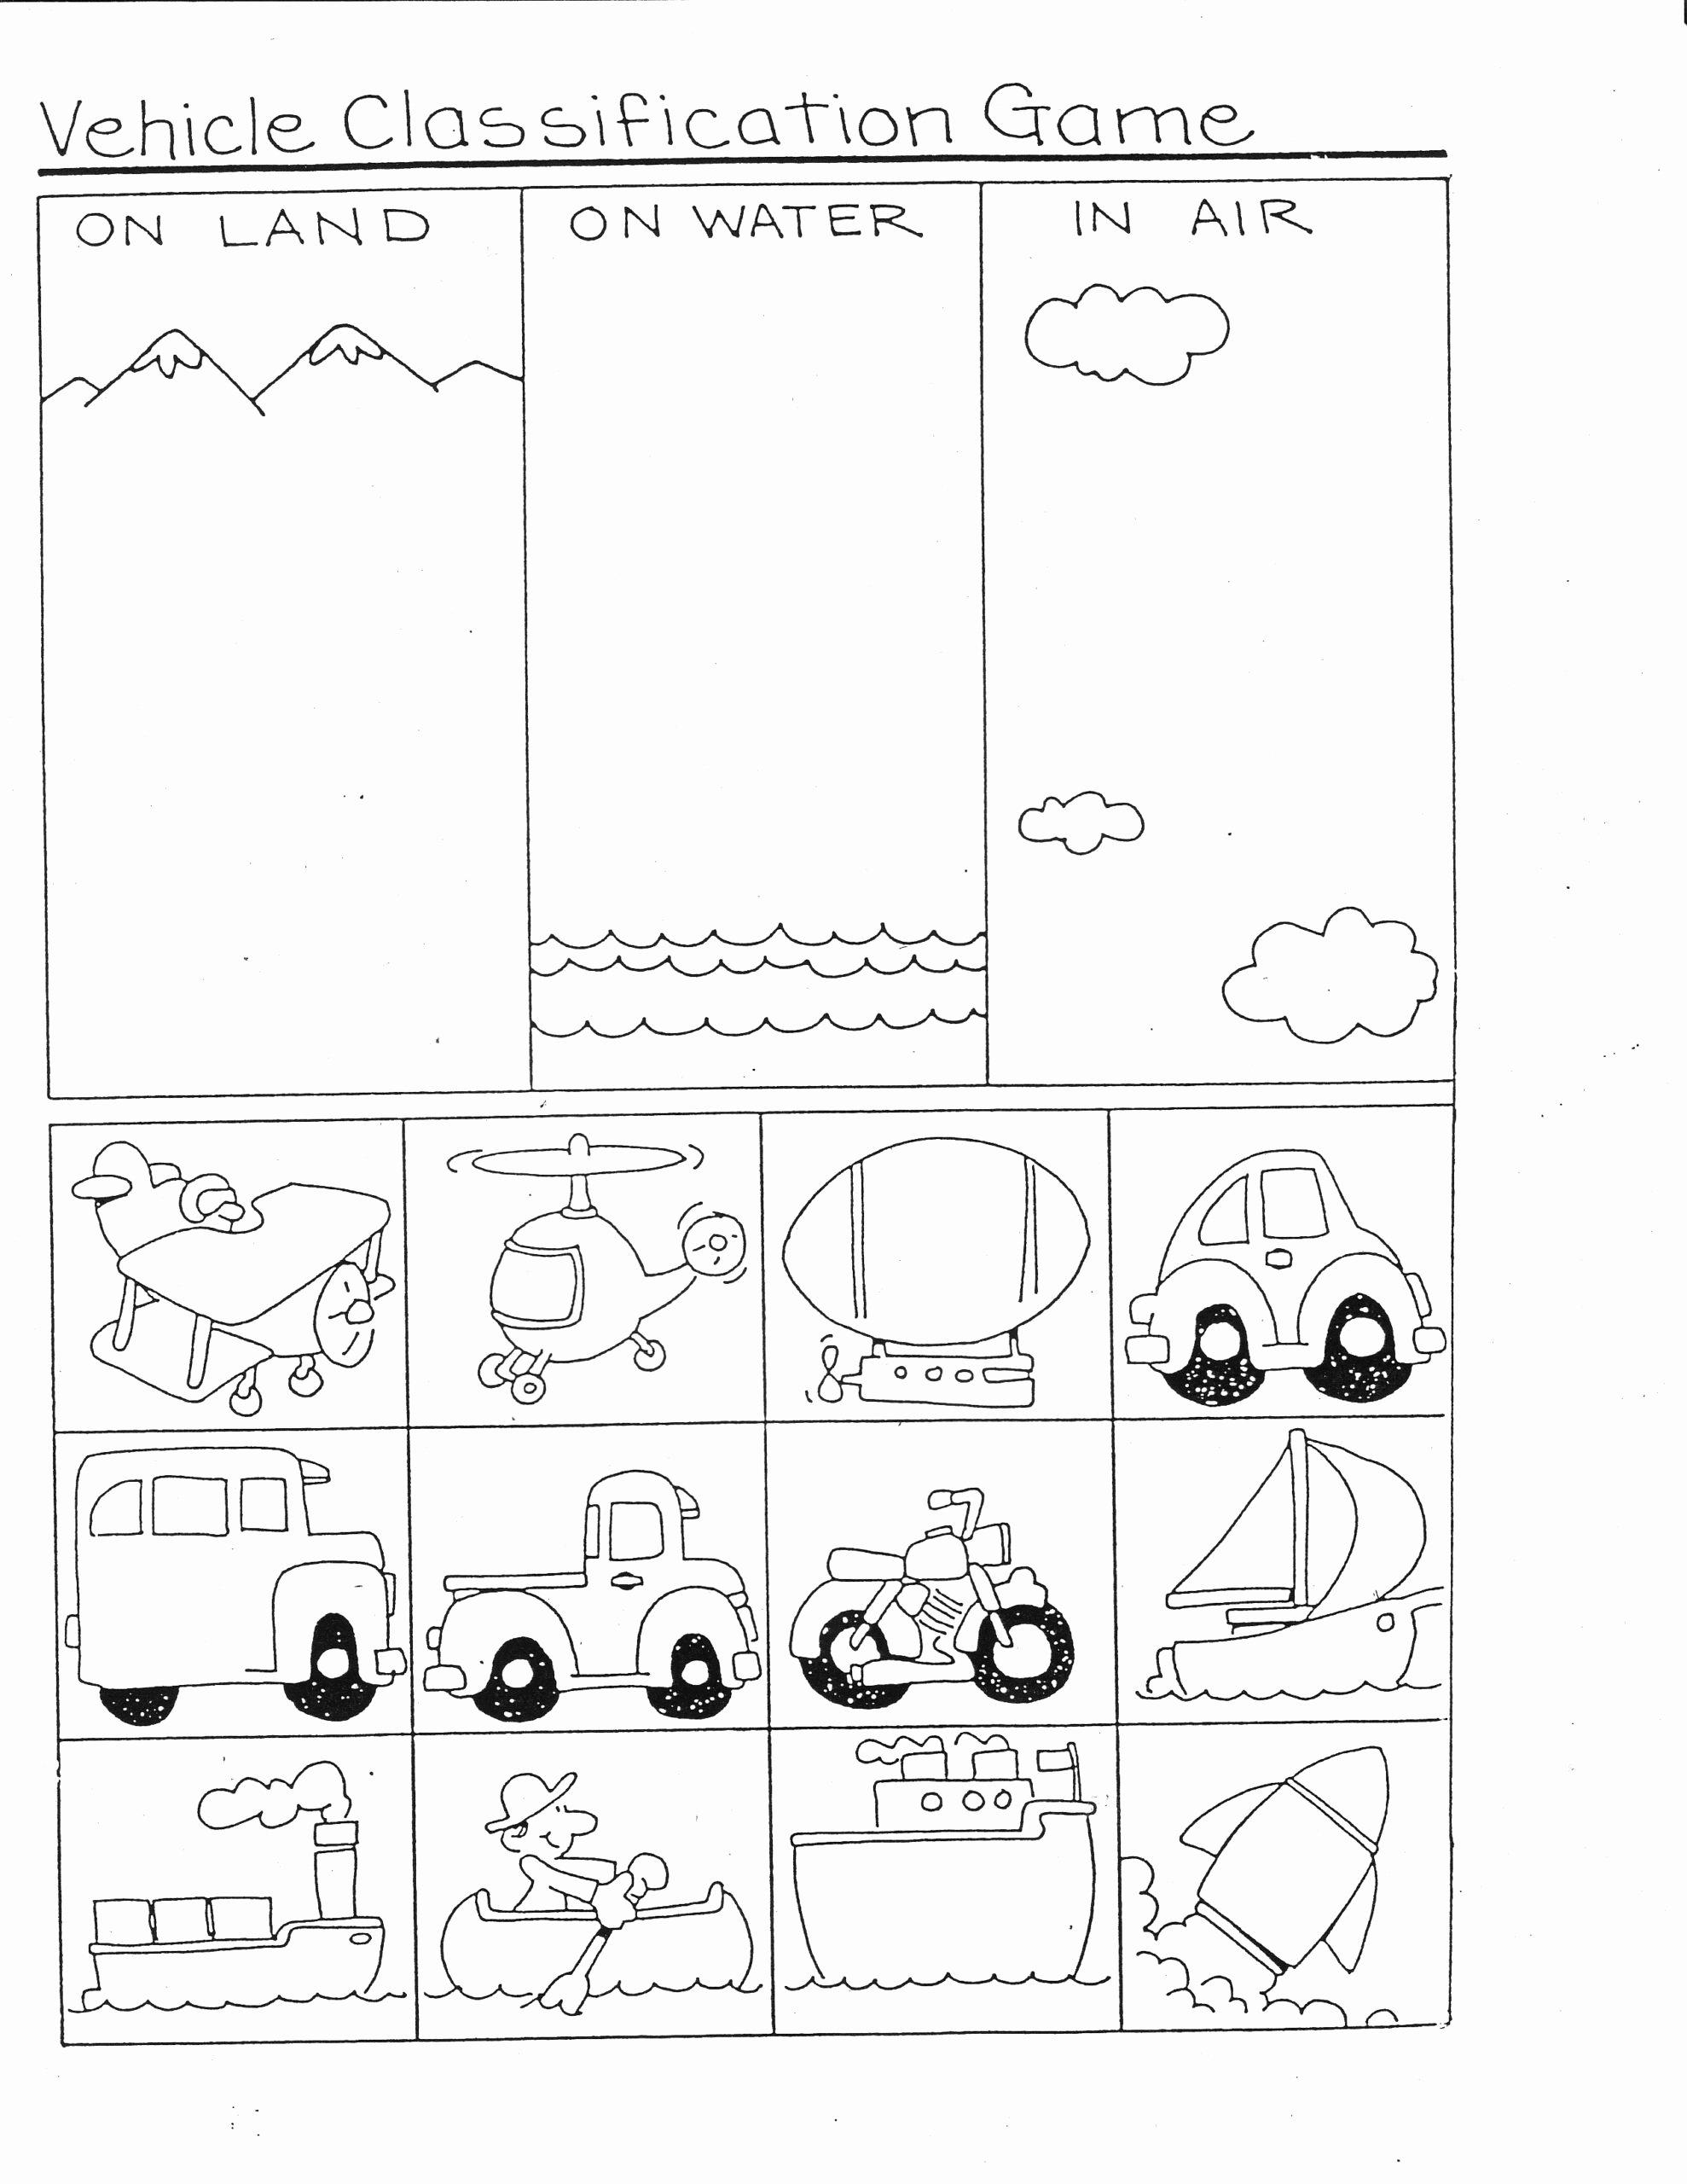 Body Parts Printable Worksheets for Preschoolers Beautiful Worksheets Preschool Printables Transportation Worksheet